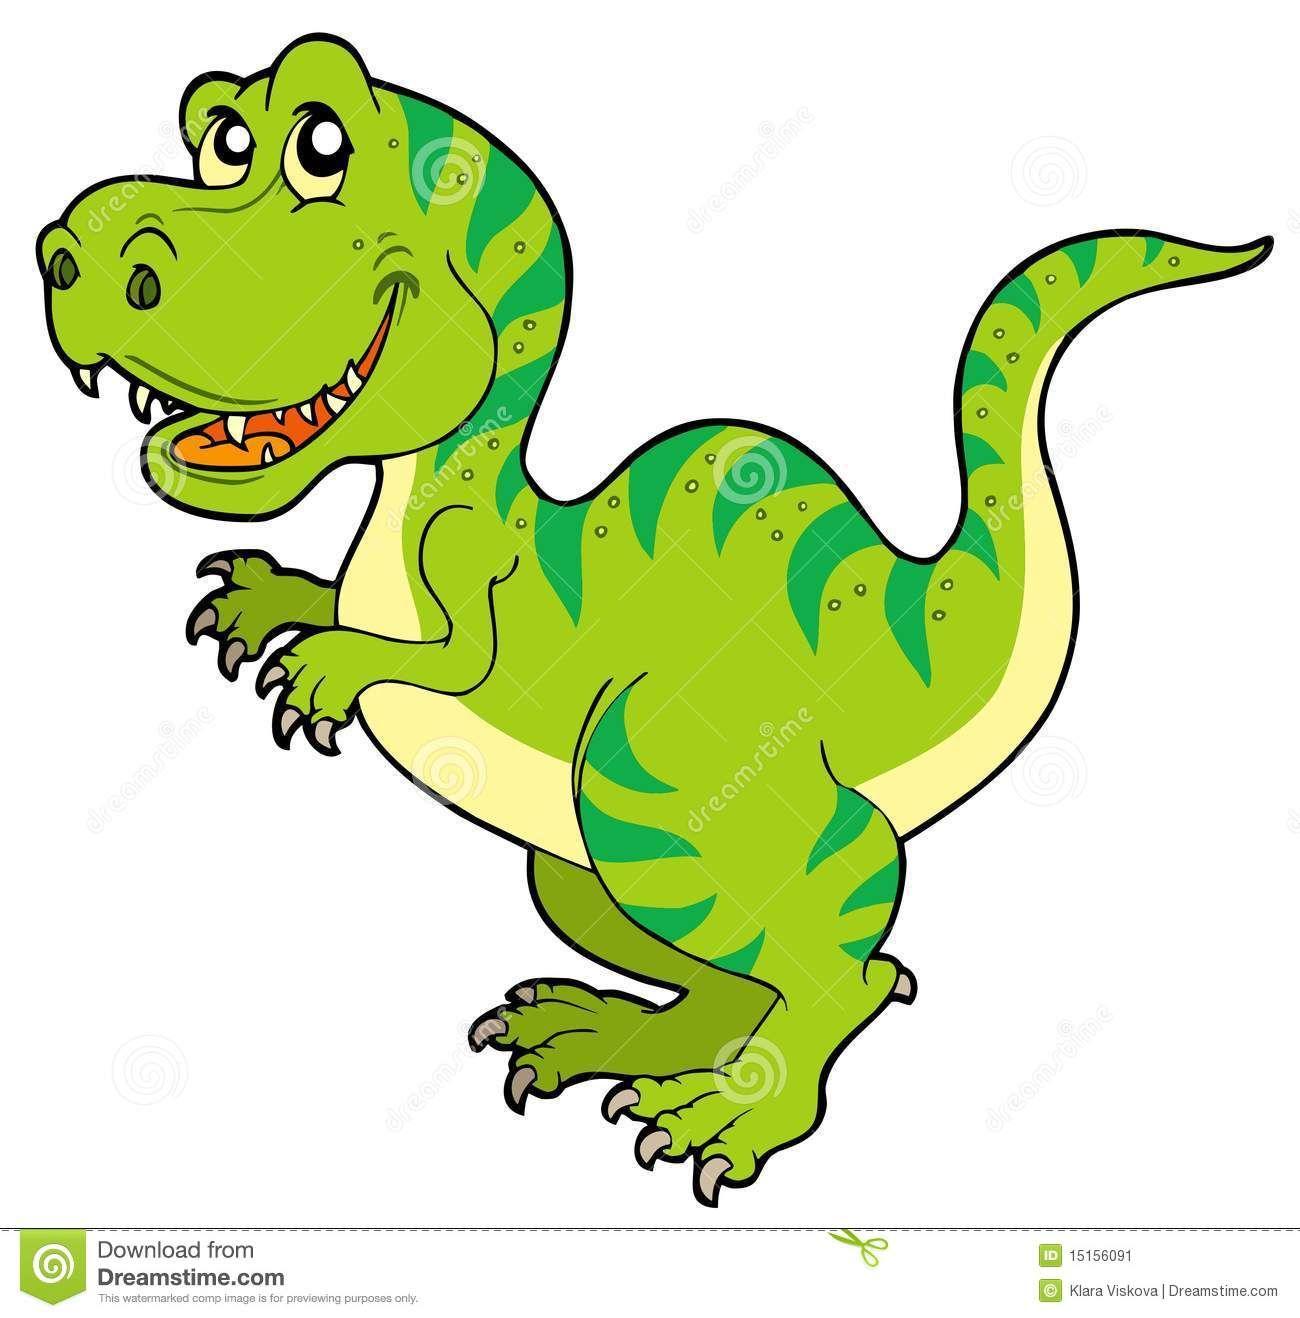 dessin dinosaure tyrannosaure couleur - Recherche Google | Art ...